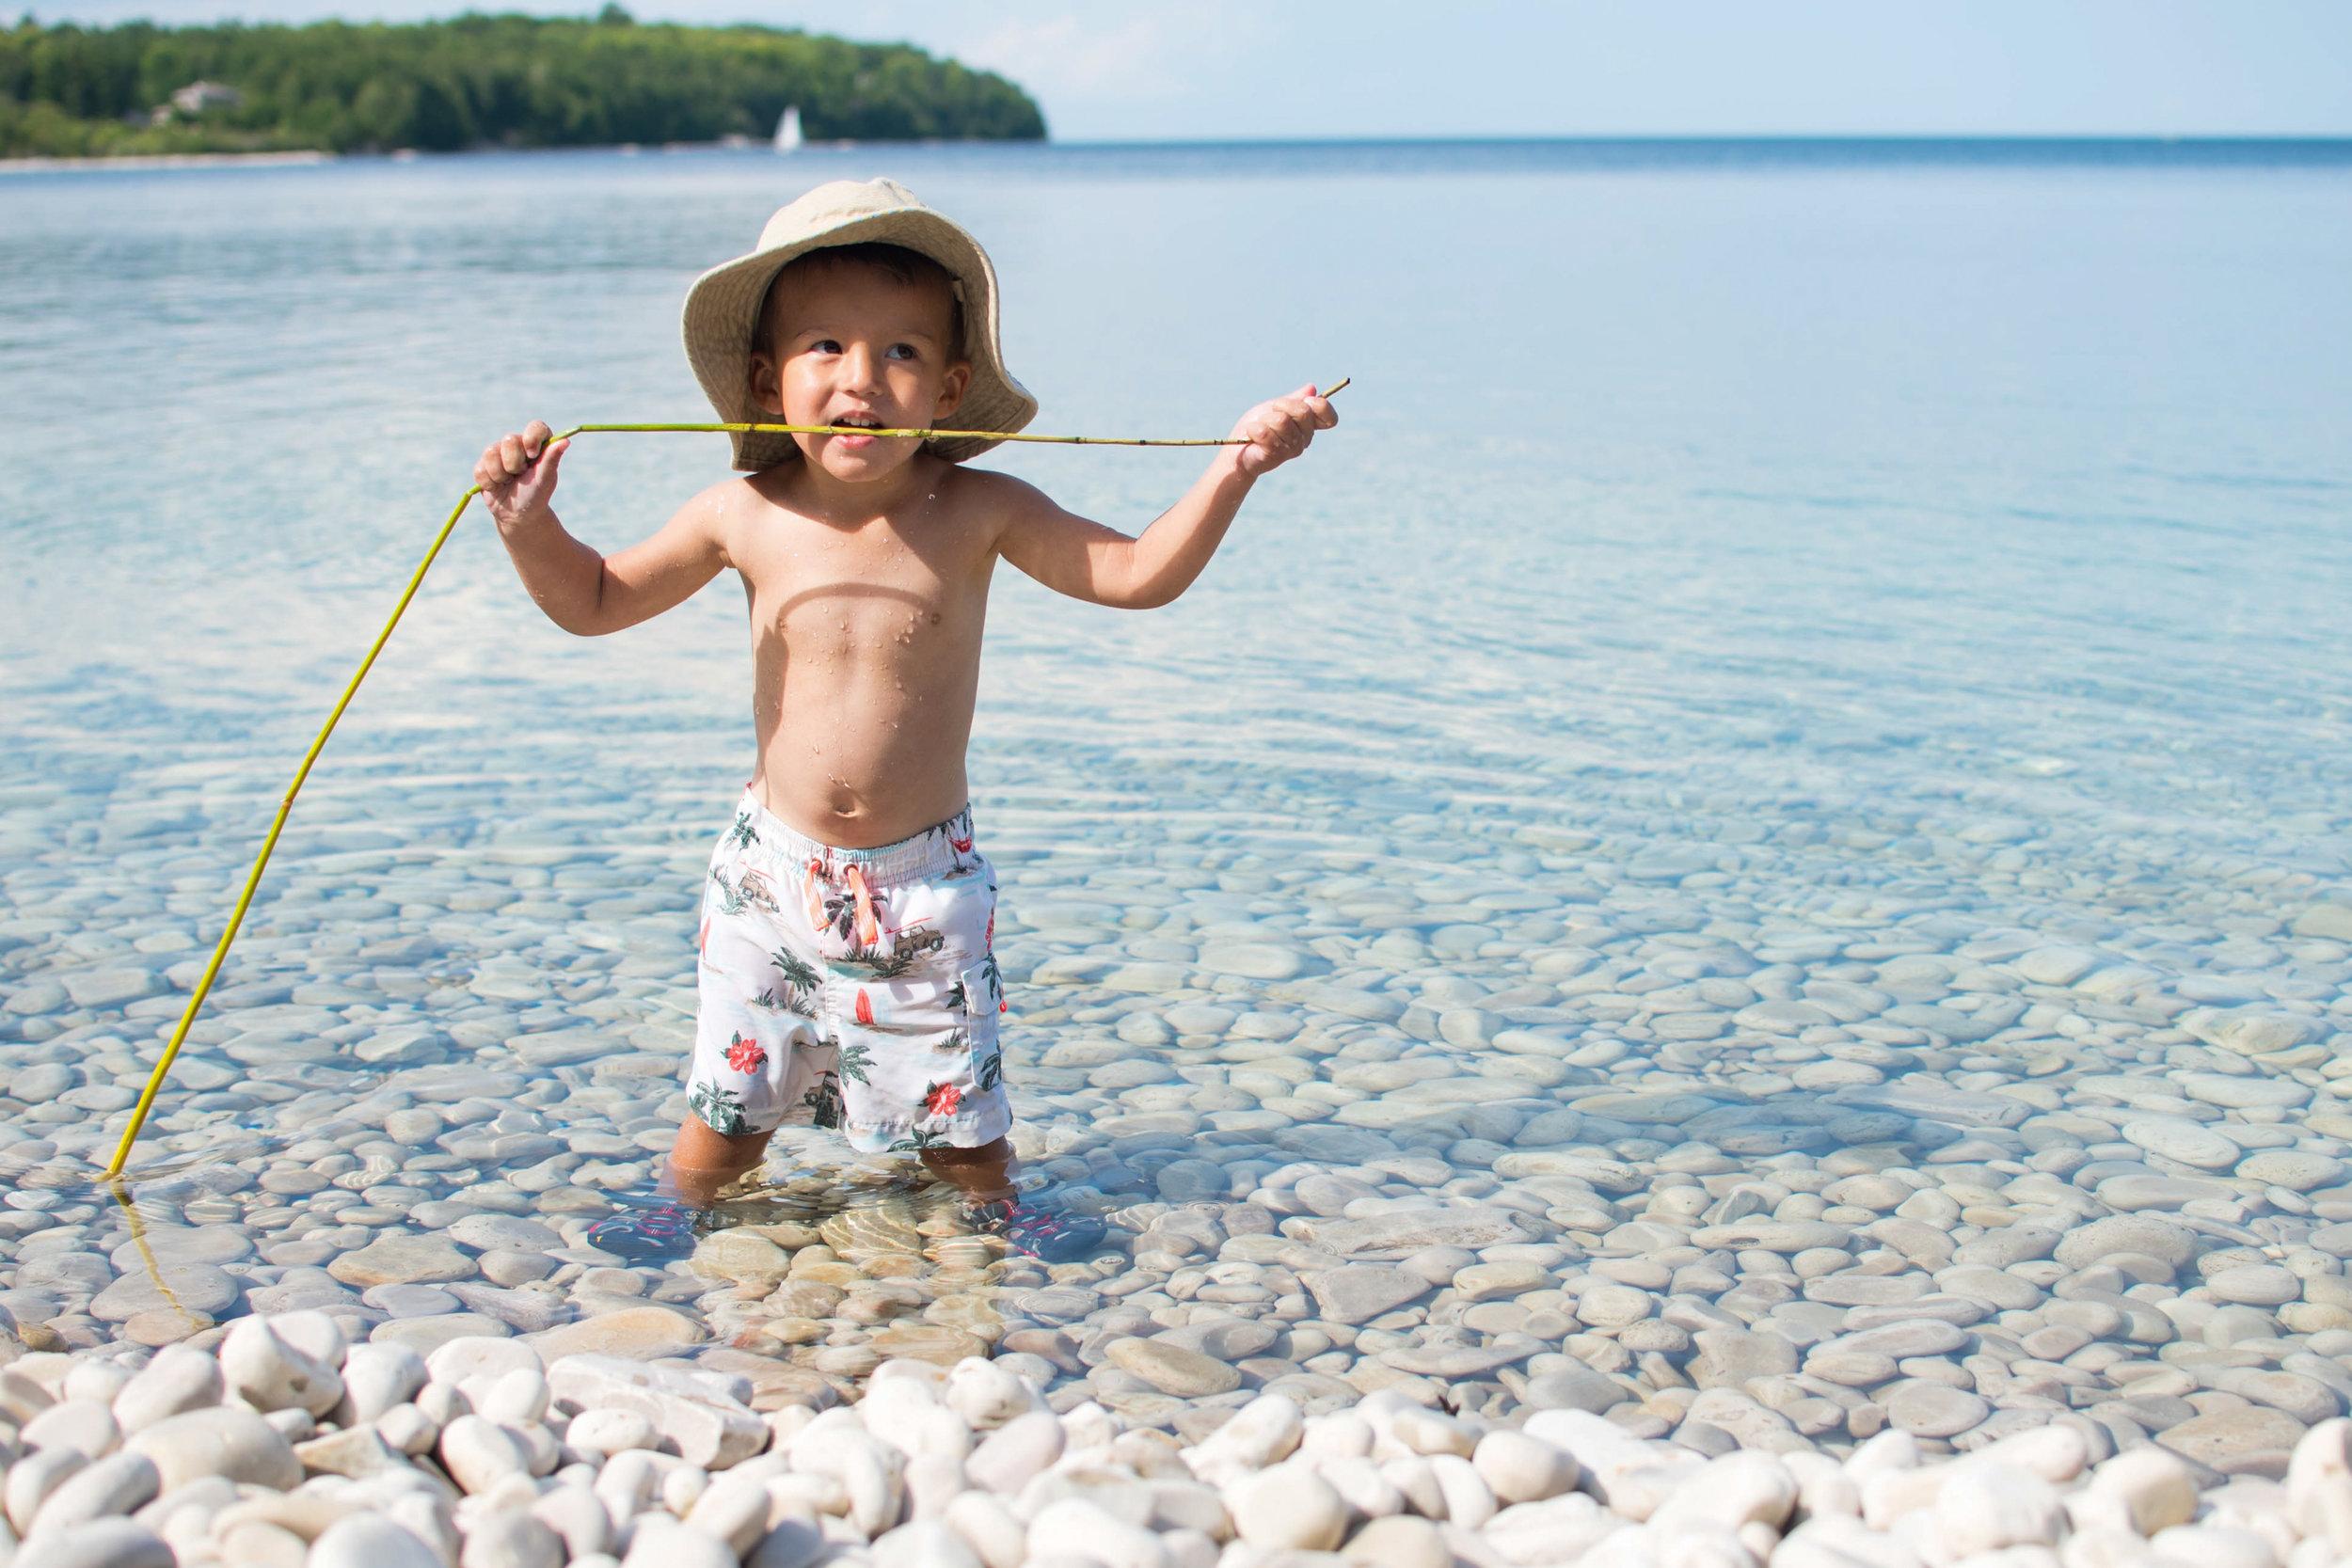 Boy eating seaweed on beach